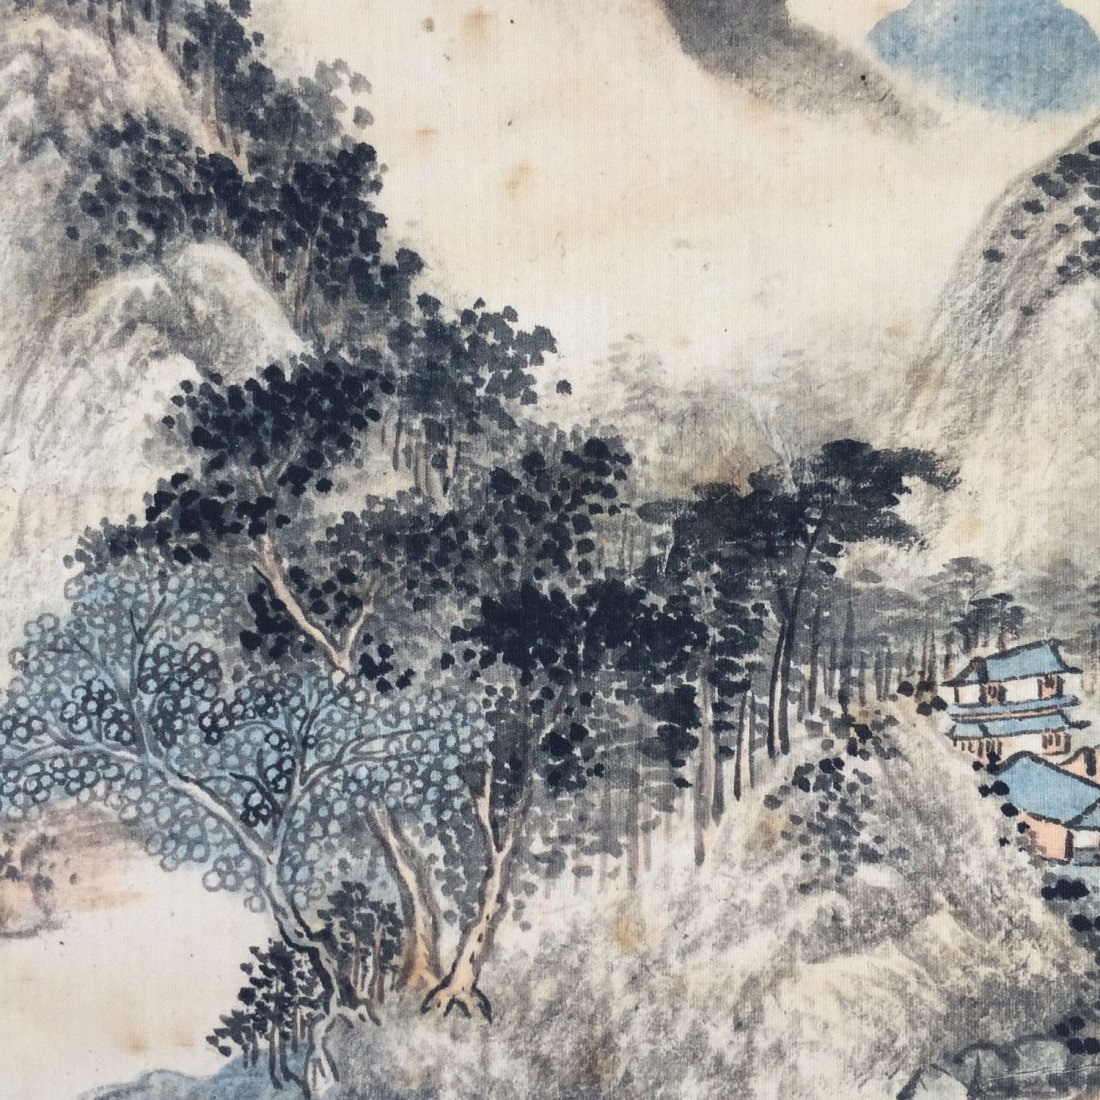 Chinese Landscape painting ( Wang Shimin signed) Print - 2